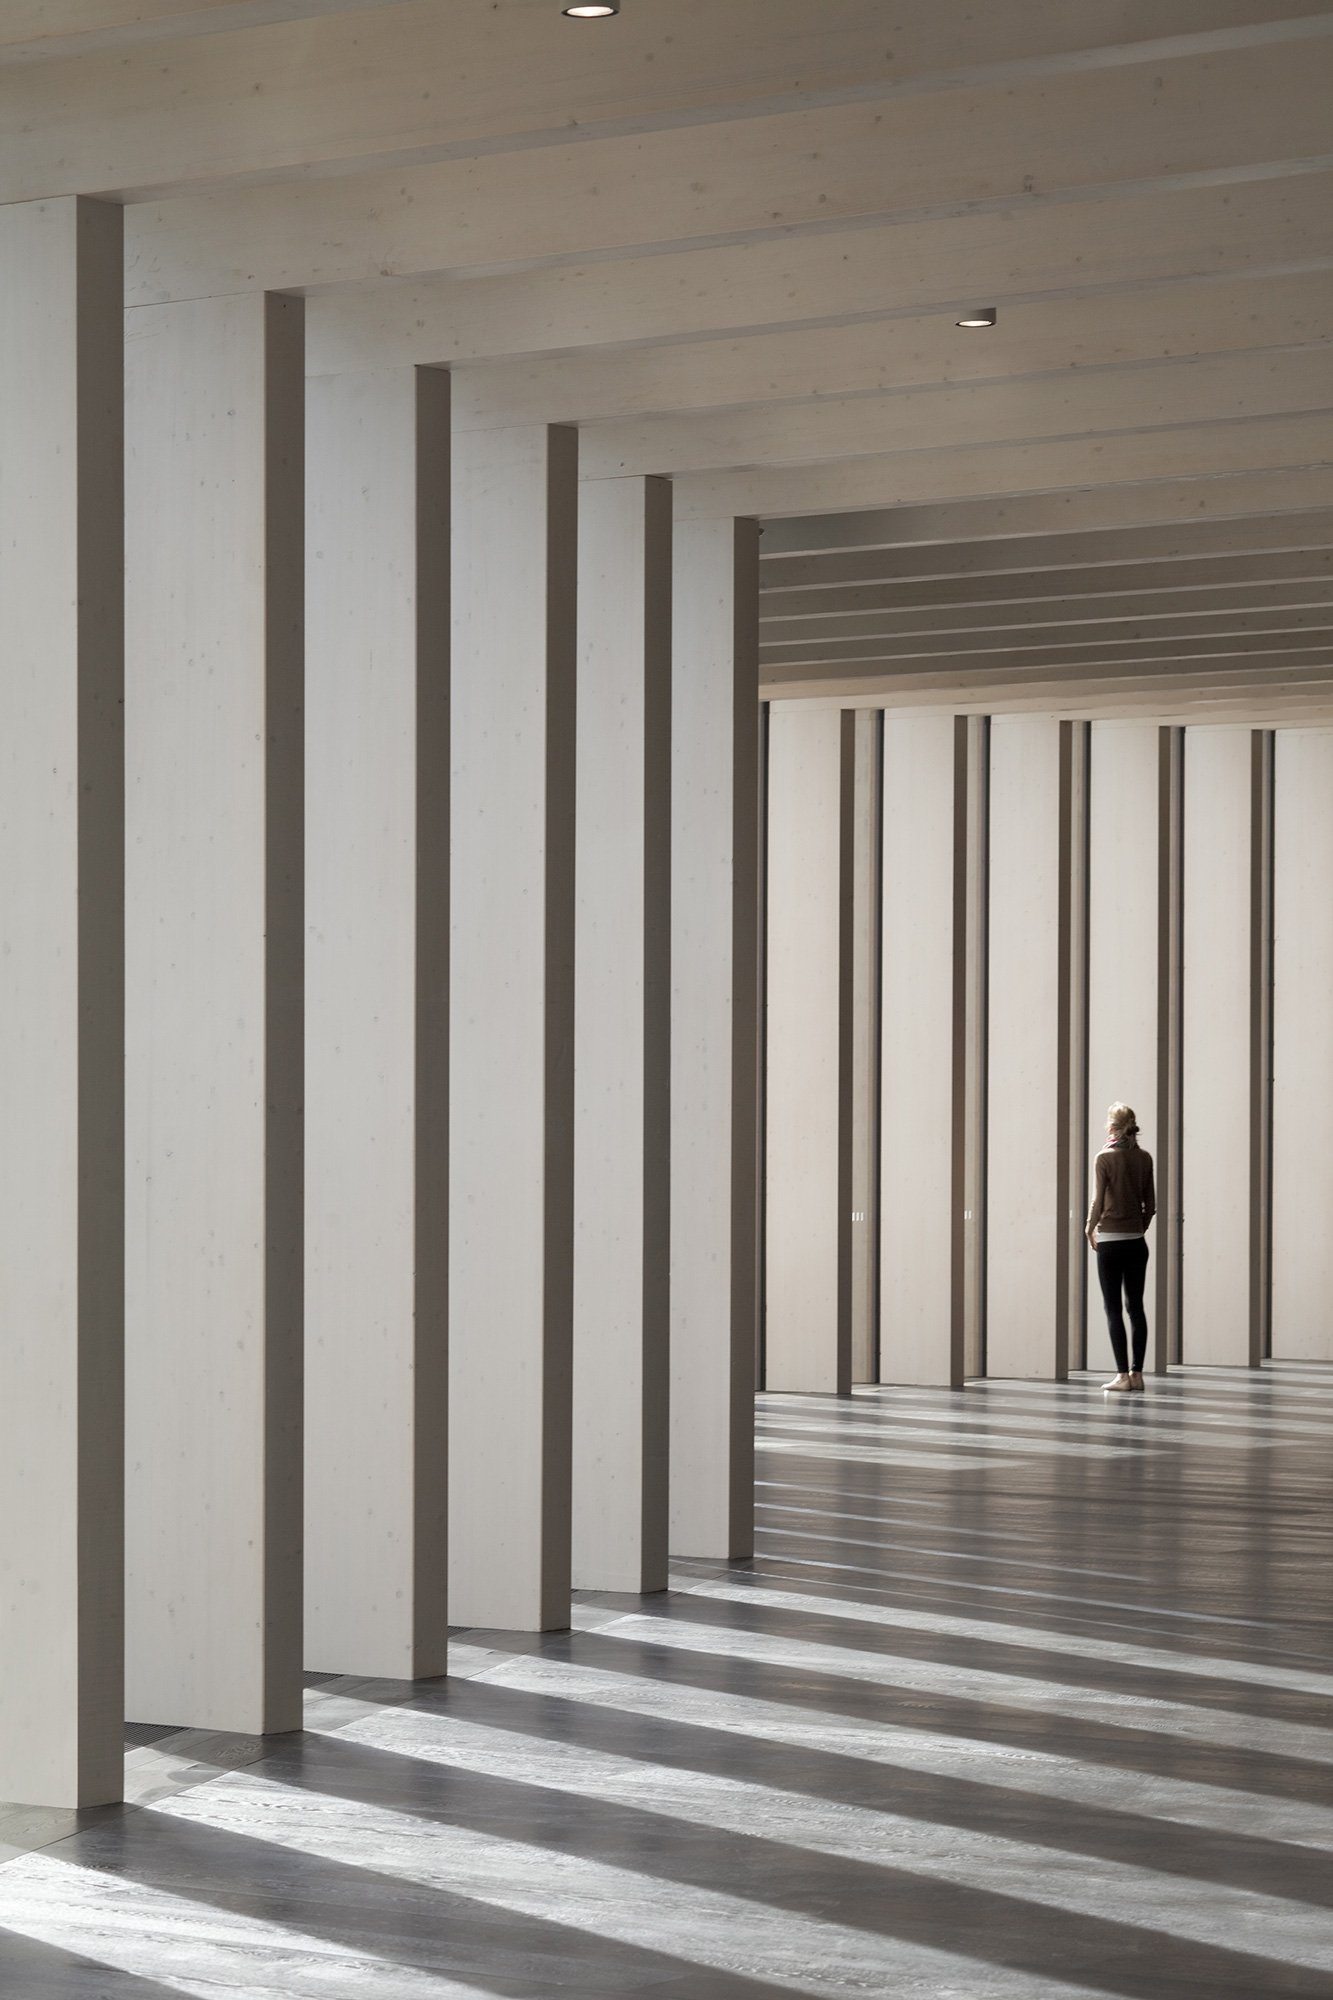 Museo d'arte contemporanea Gösta Serlachius © Pedro Pegenaute